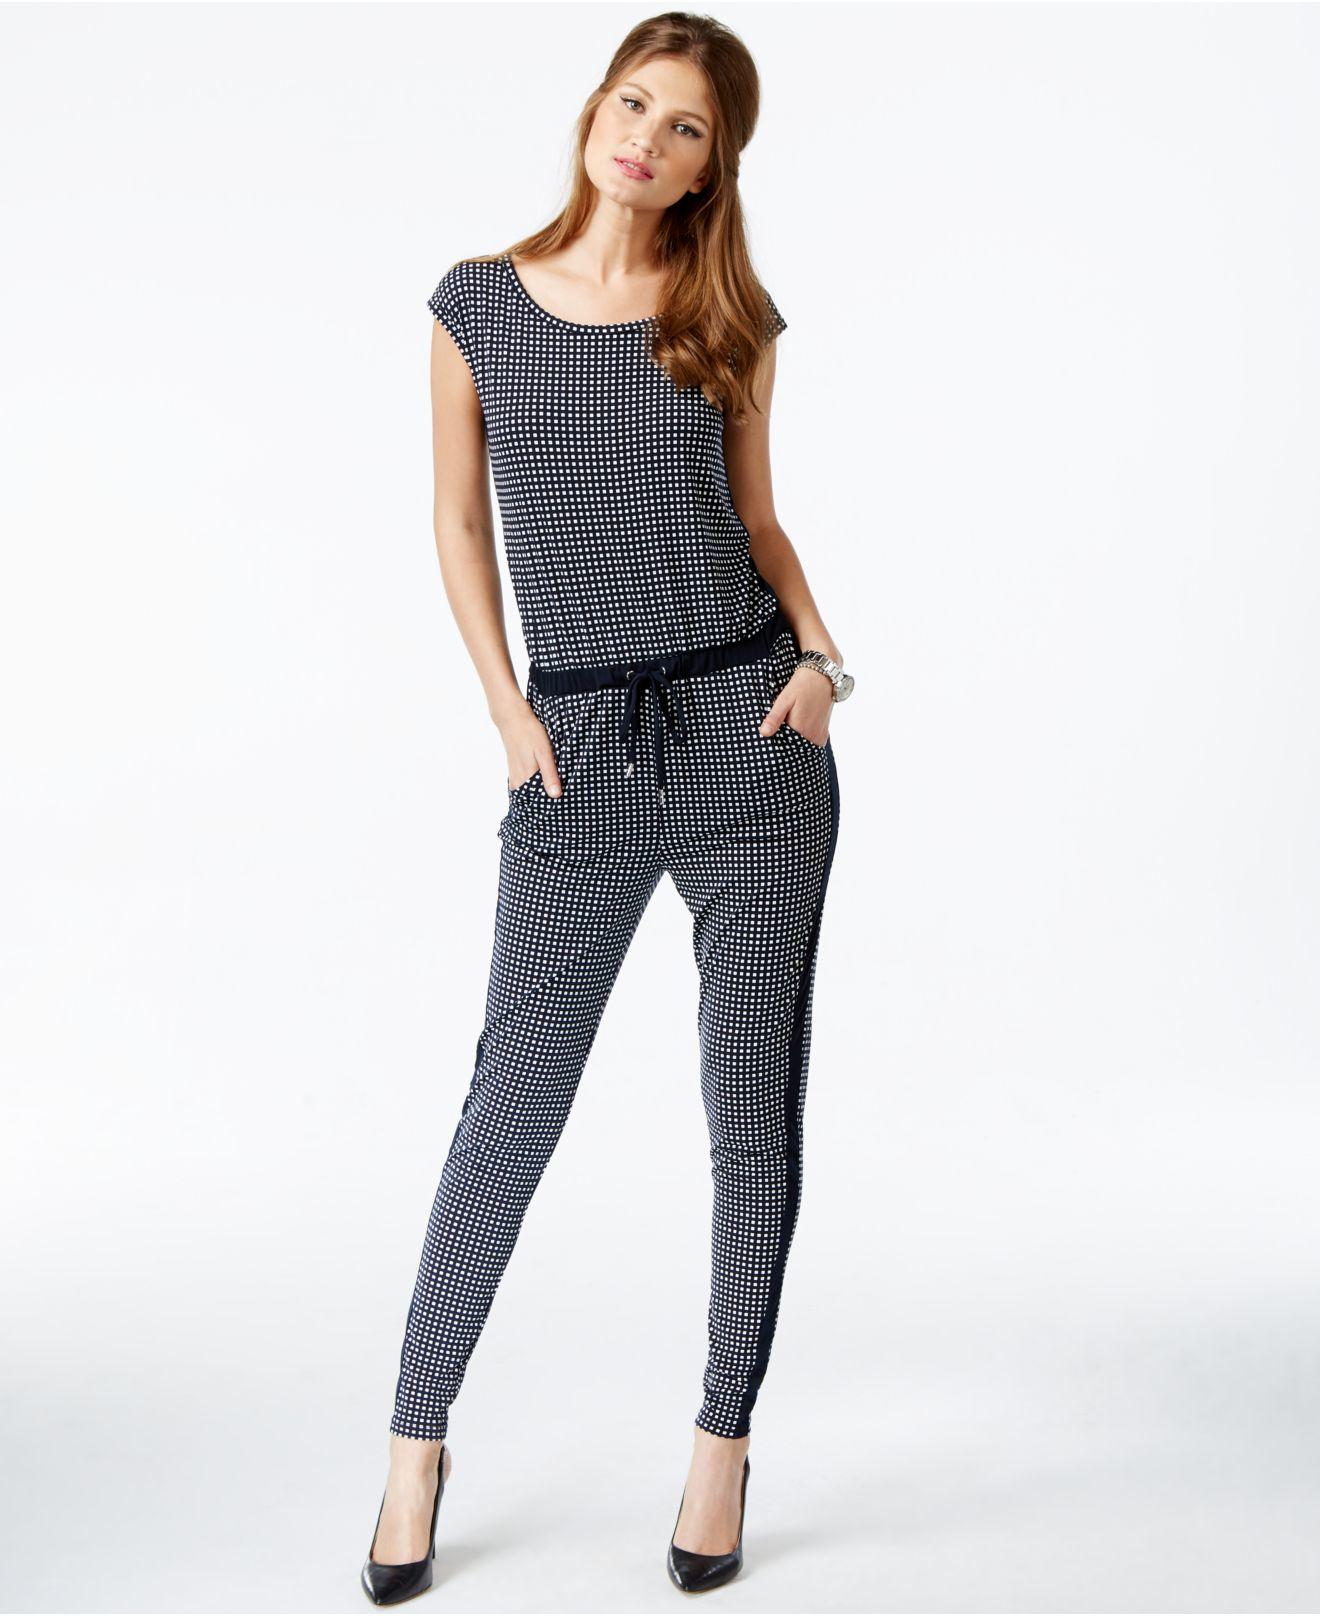 lyst michael kors michael petite printed side stripe jumpsuit in blue. Black Bedroom Furniture Sets. Home Design Ideas